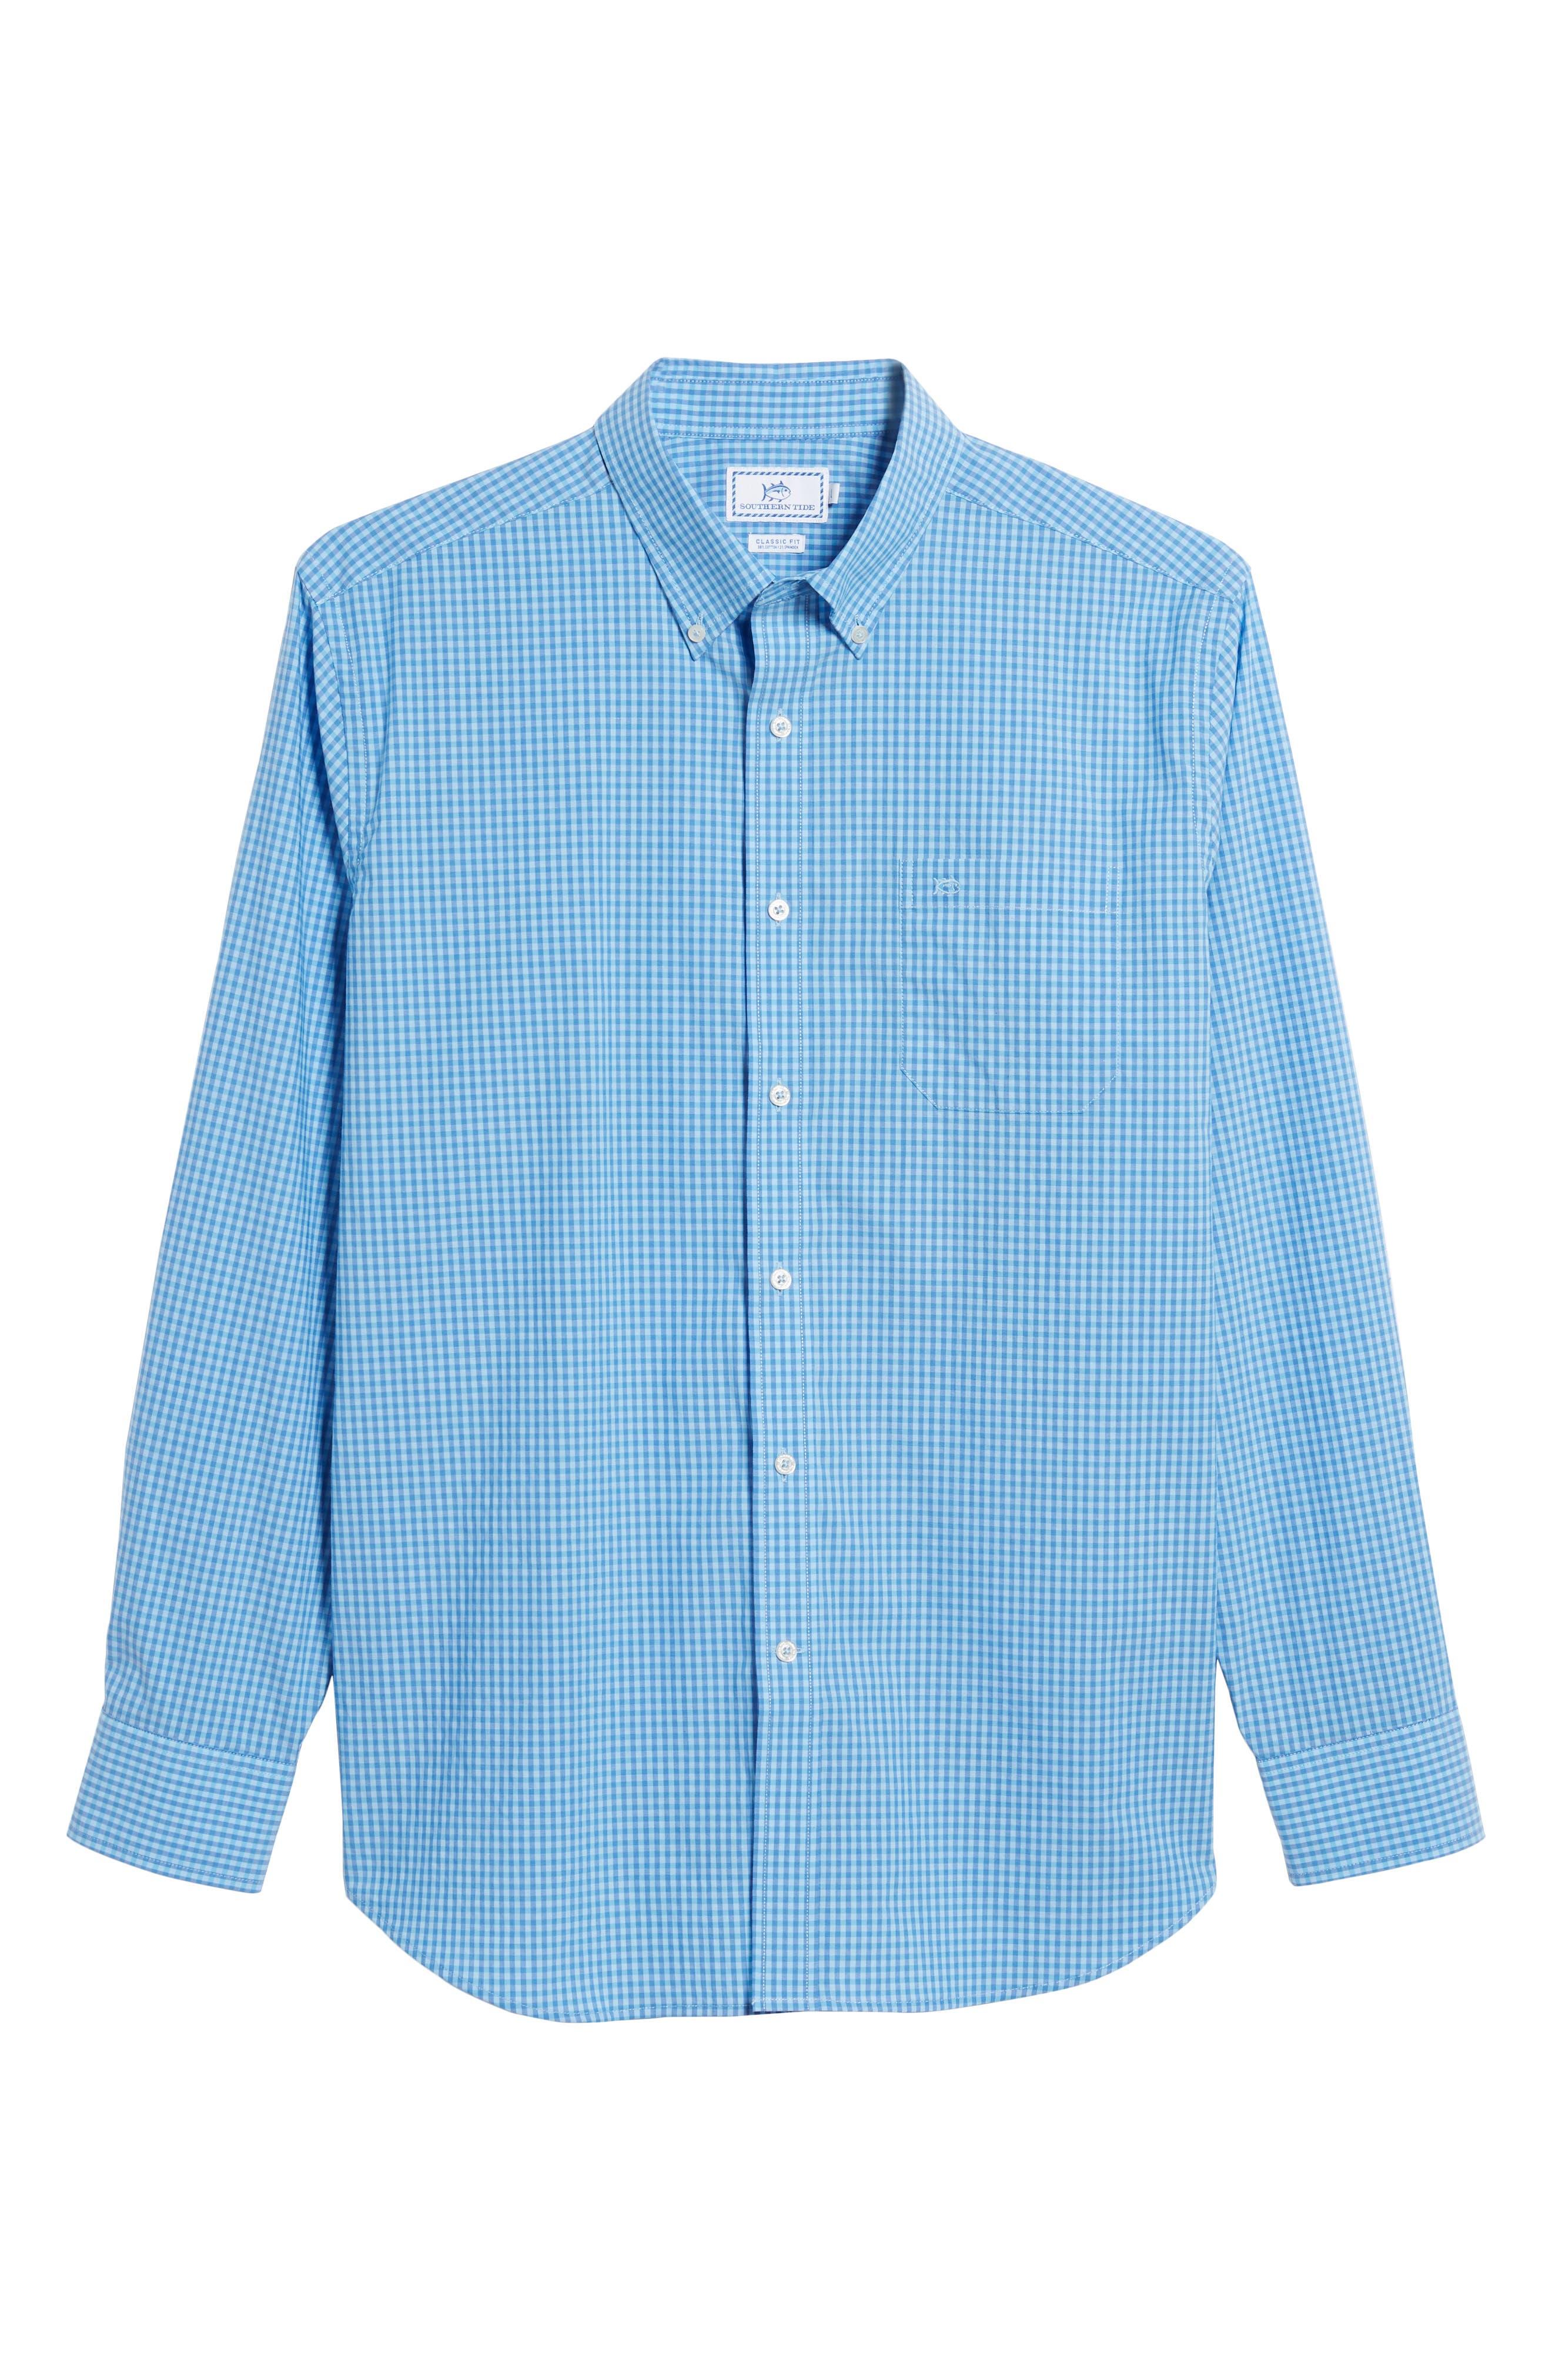 Camana Bay Regular Fit Check Stretch Sport Shirt,                             Alternate thumbnail 6, color,                             392